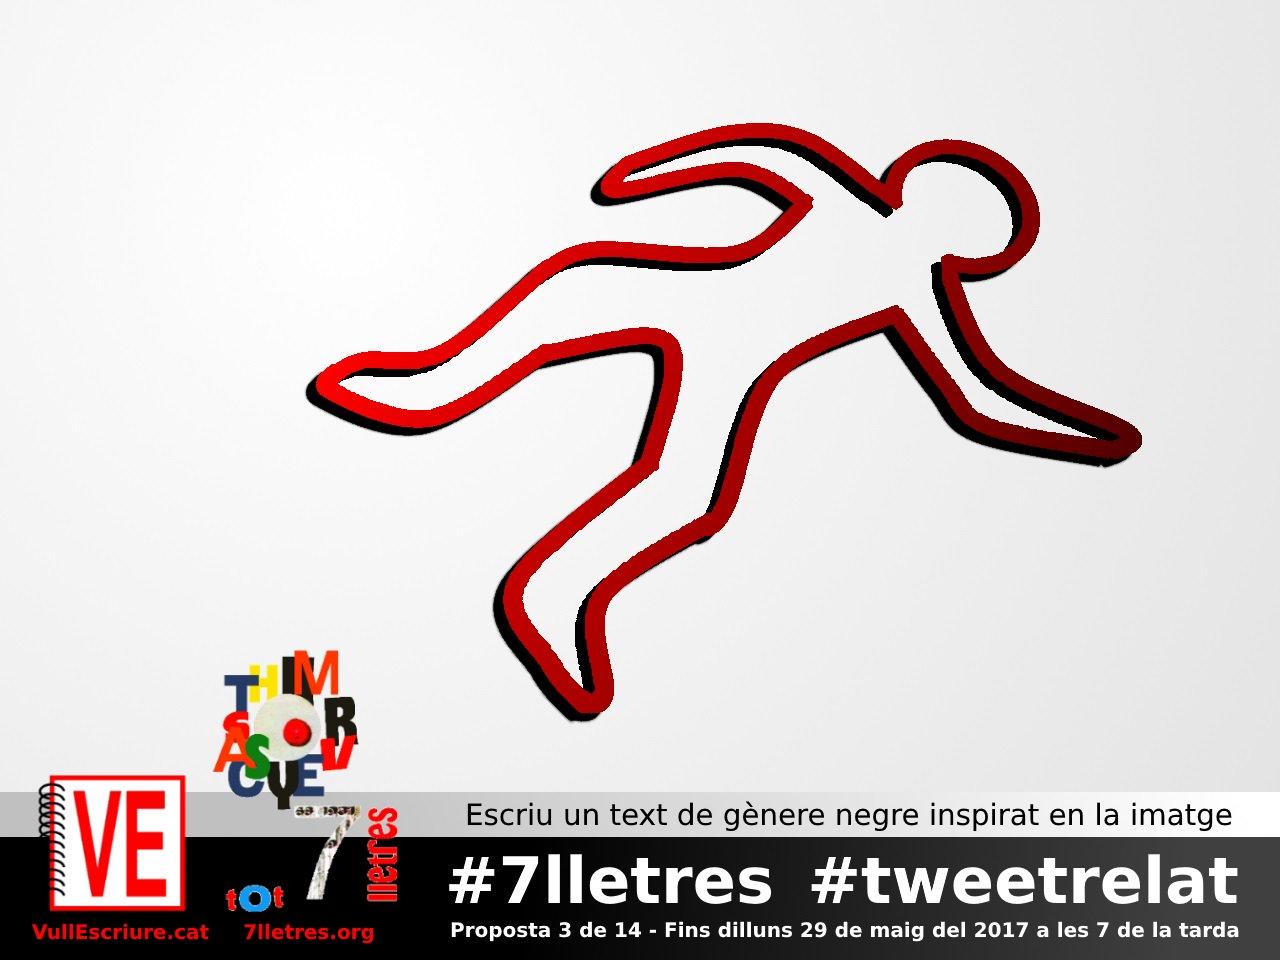 Thumbnail for VullEscriure - Marató #7lletres #tweetrelat (2a setmana)